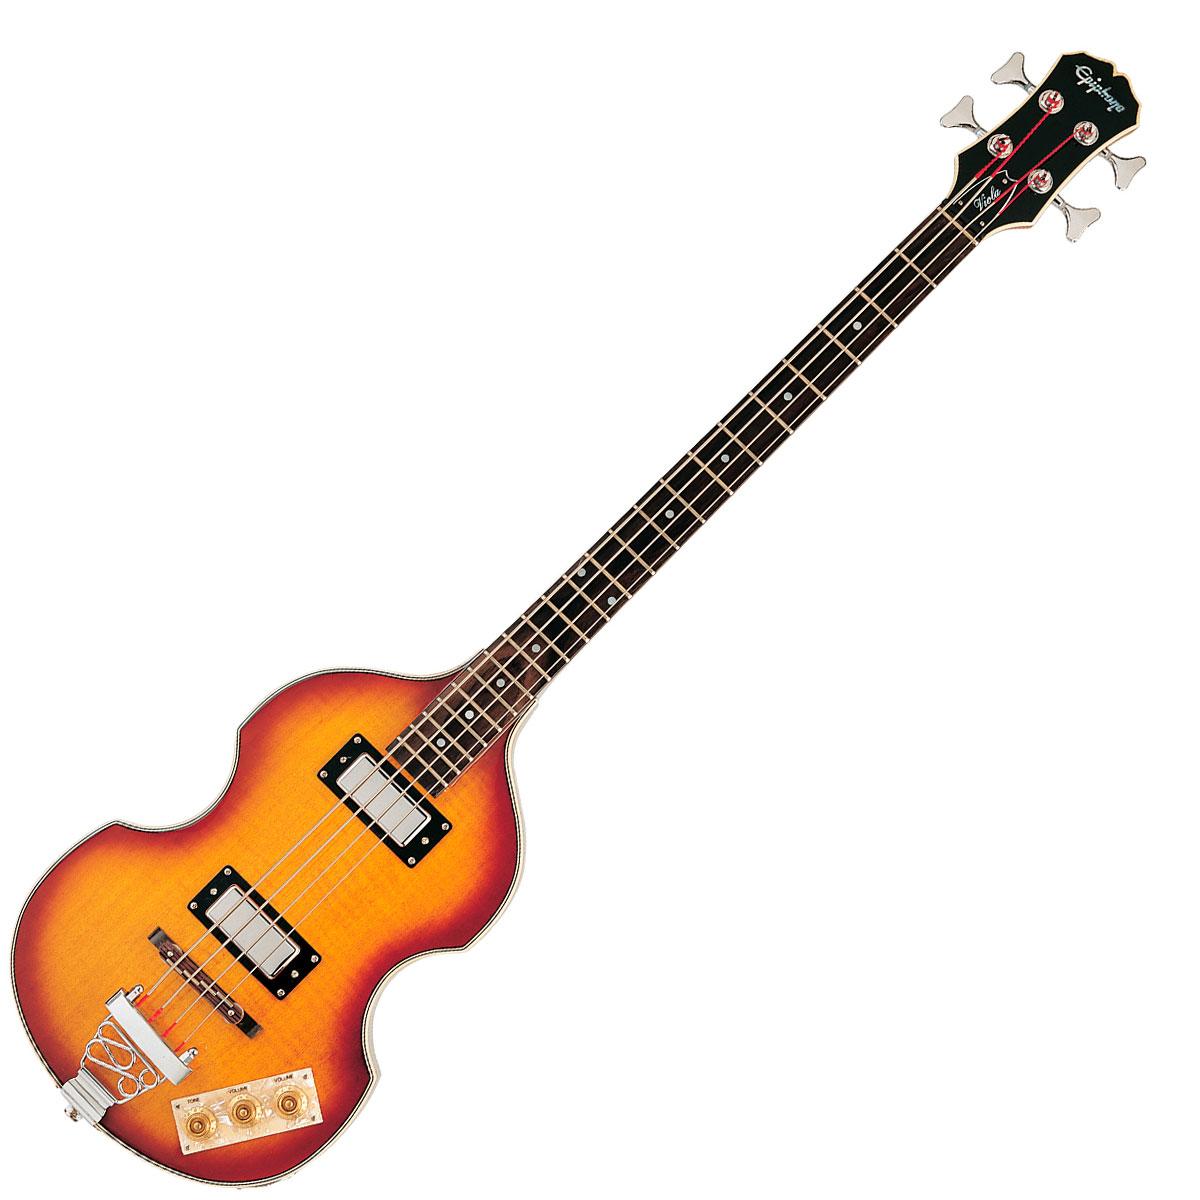 Contrabaixo Passivo 4 Cordas - Viola Bass Epiphone